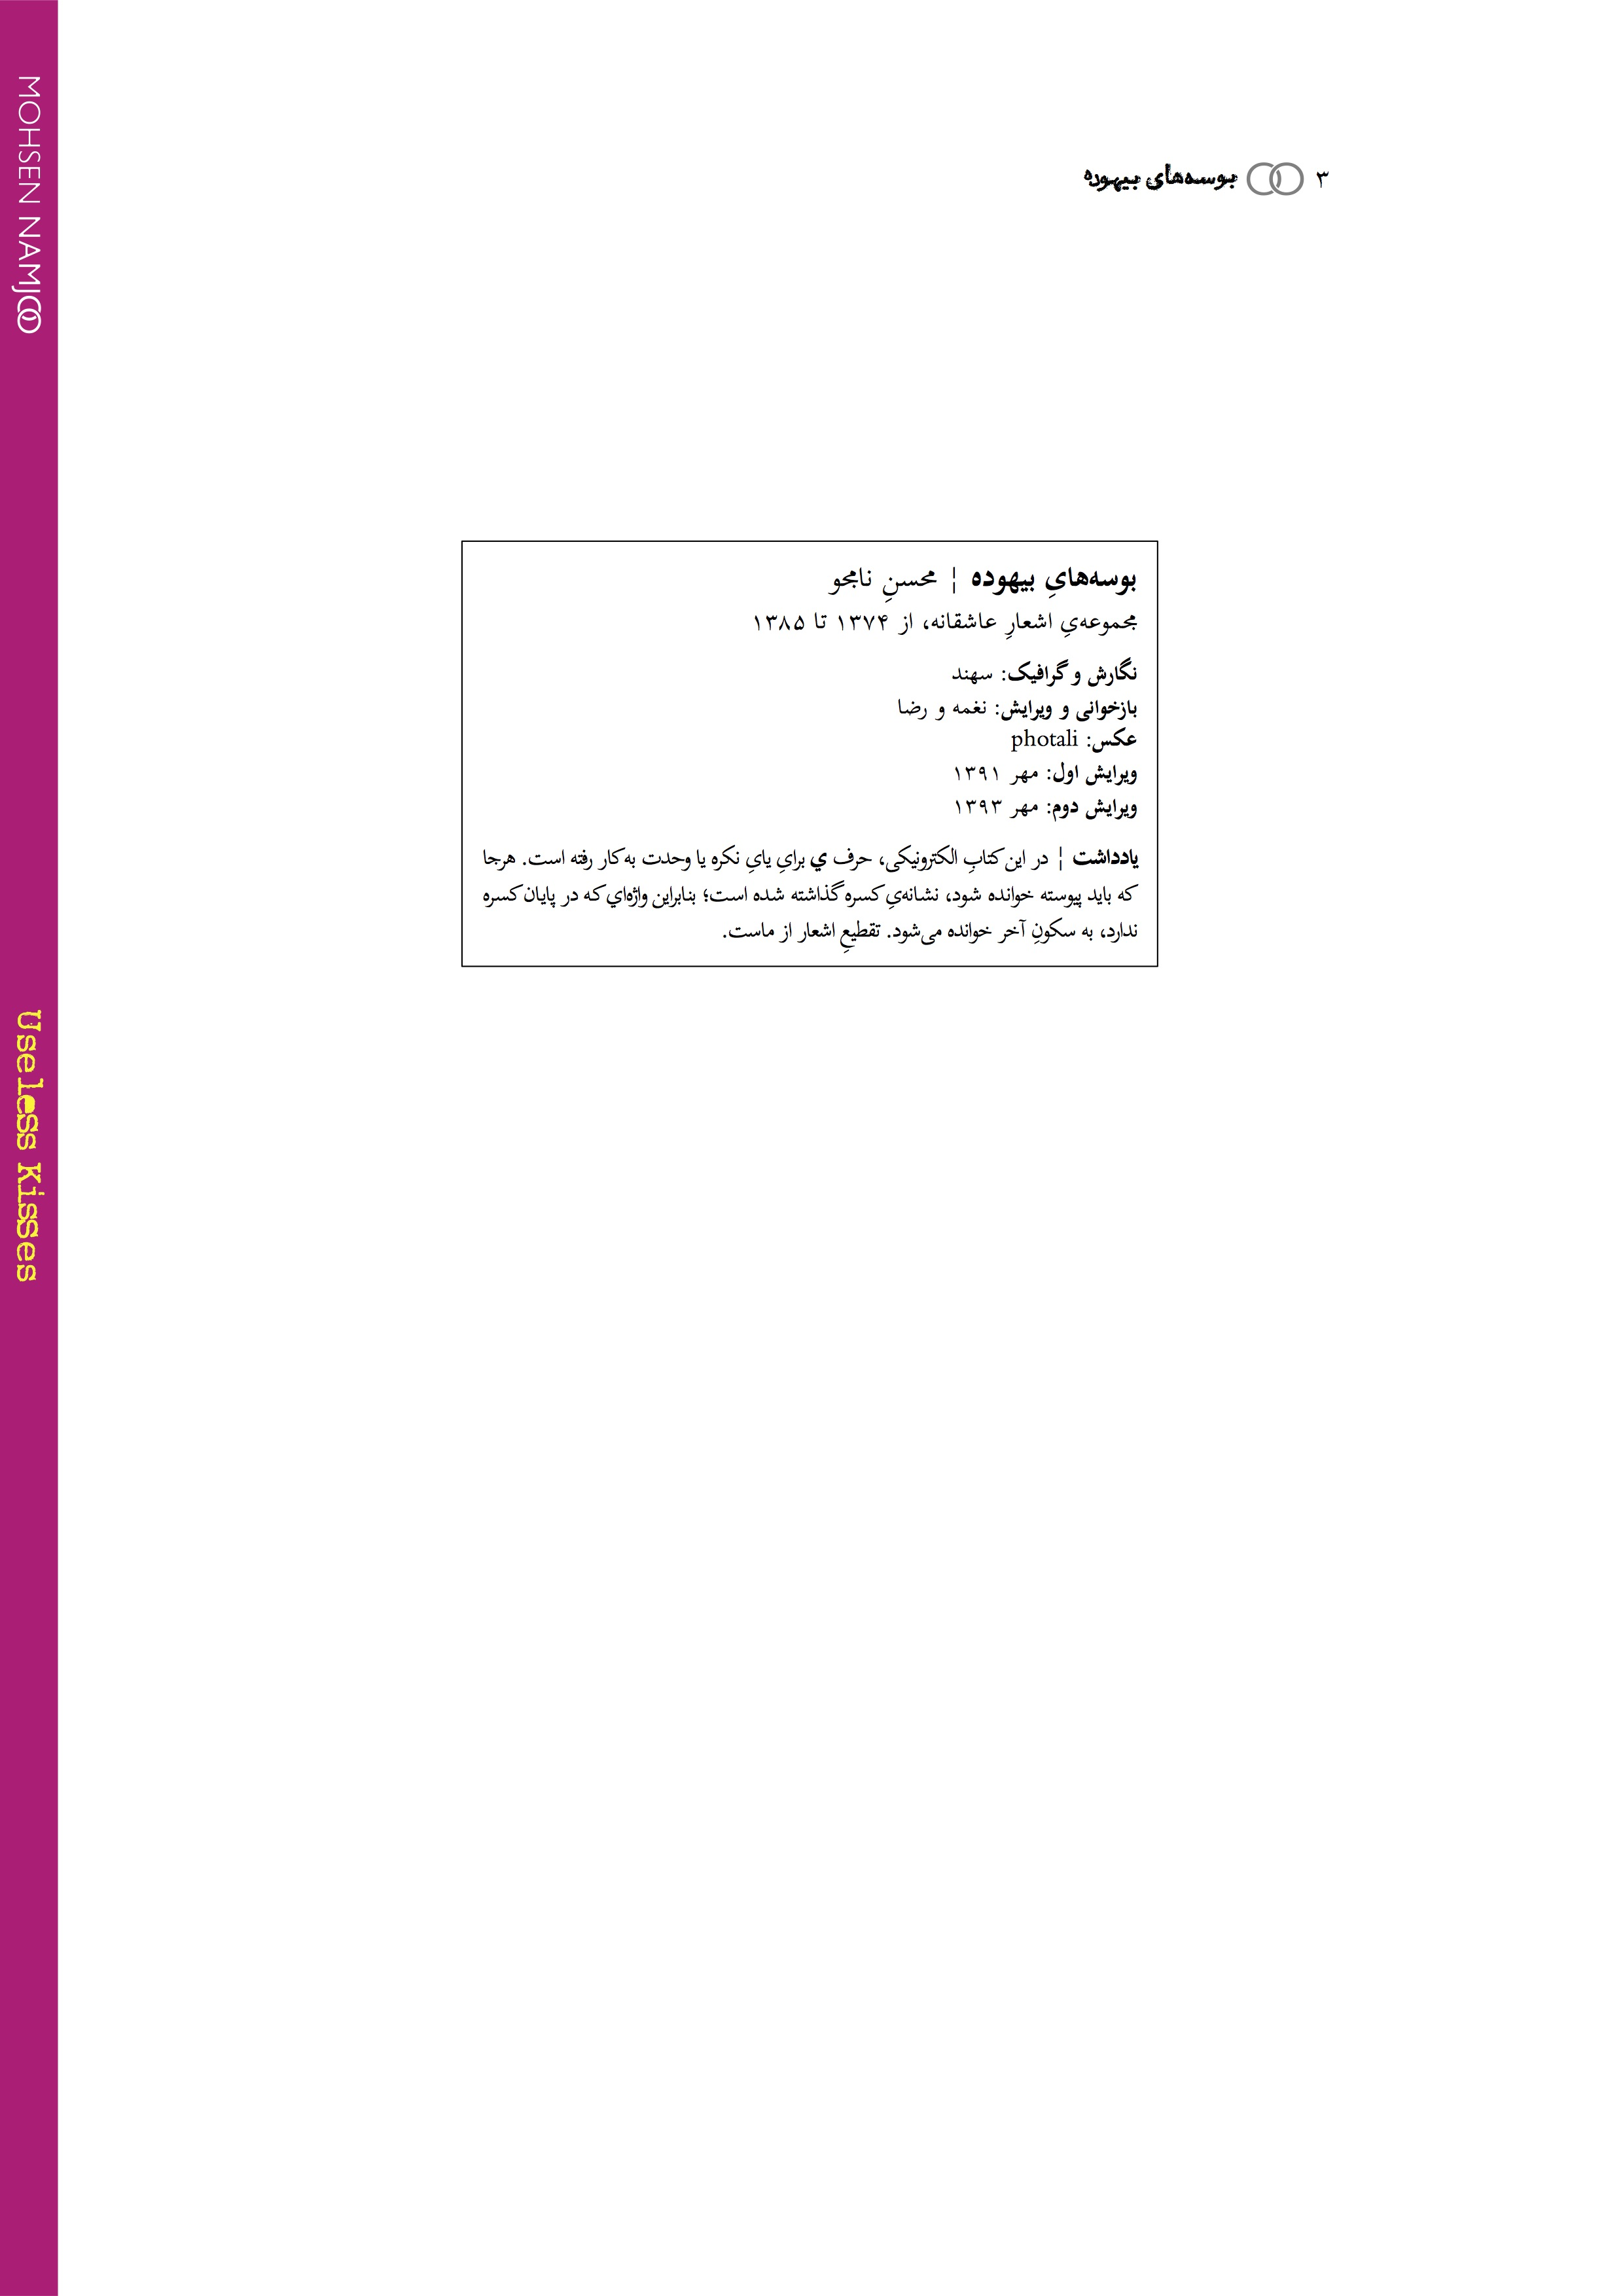 2Useless Kisses eBook (2nd Edition).jpg